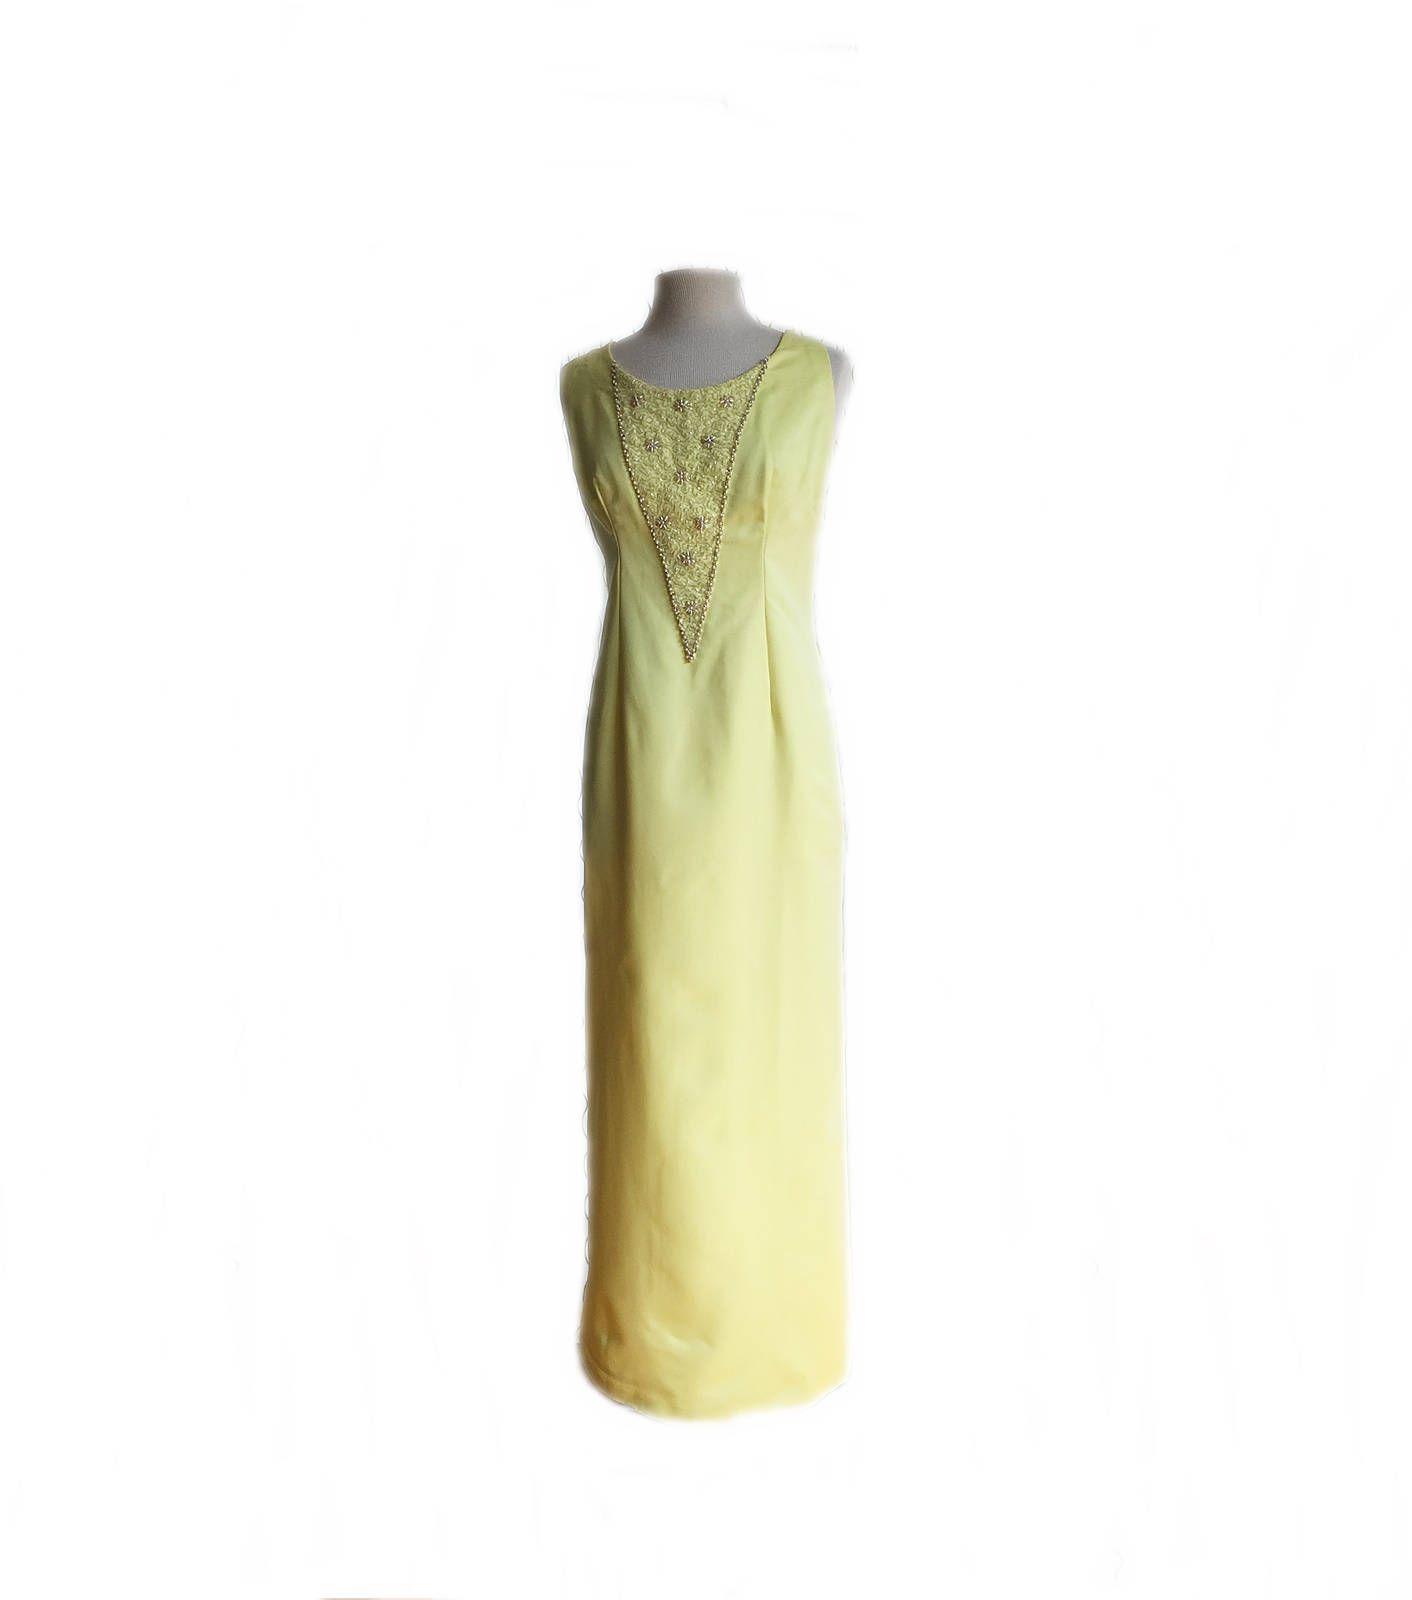 44f9491d105 Vintage 70s beaded lemon yellow gown  pastel yellow maxi dress  long  bridesmaid dress  pearl trim beaded panel  vintagedress  vintagefashion   vintage